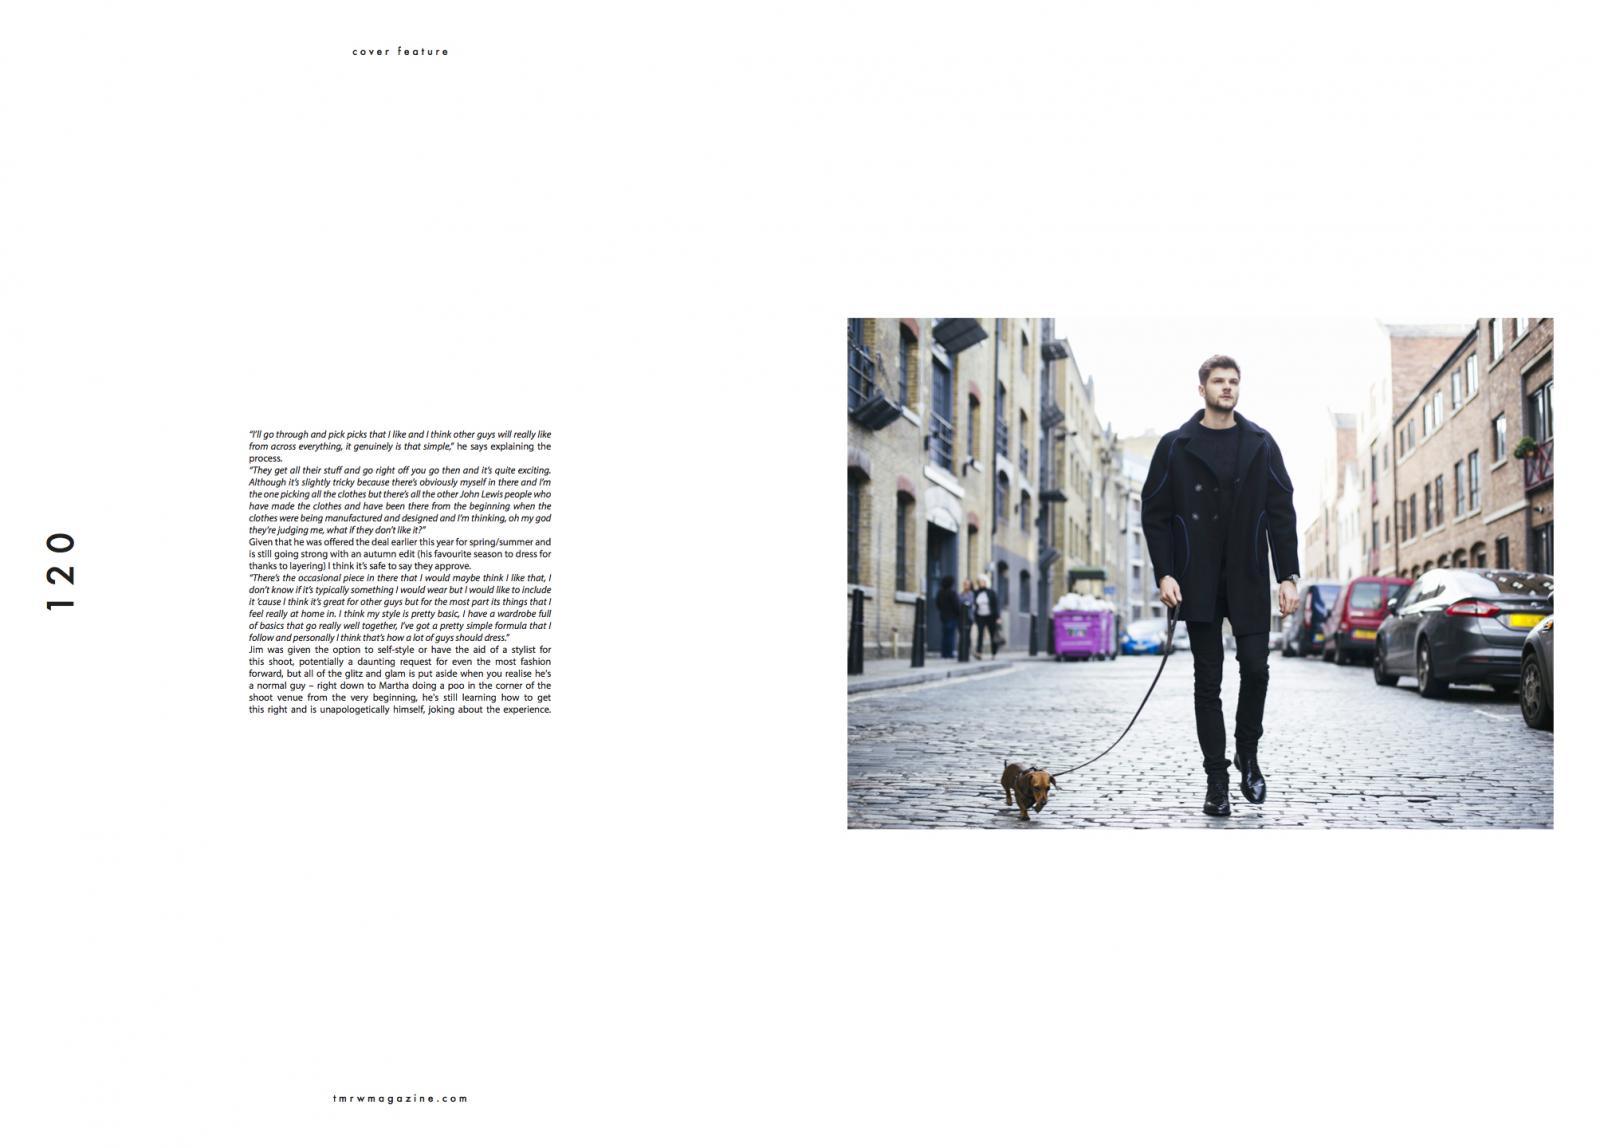 tmrw-magazine-nov163